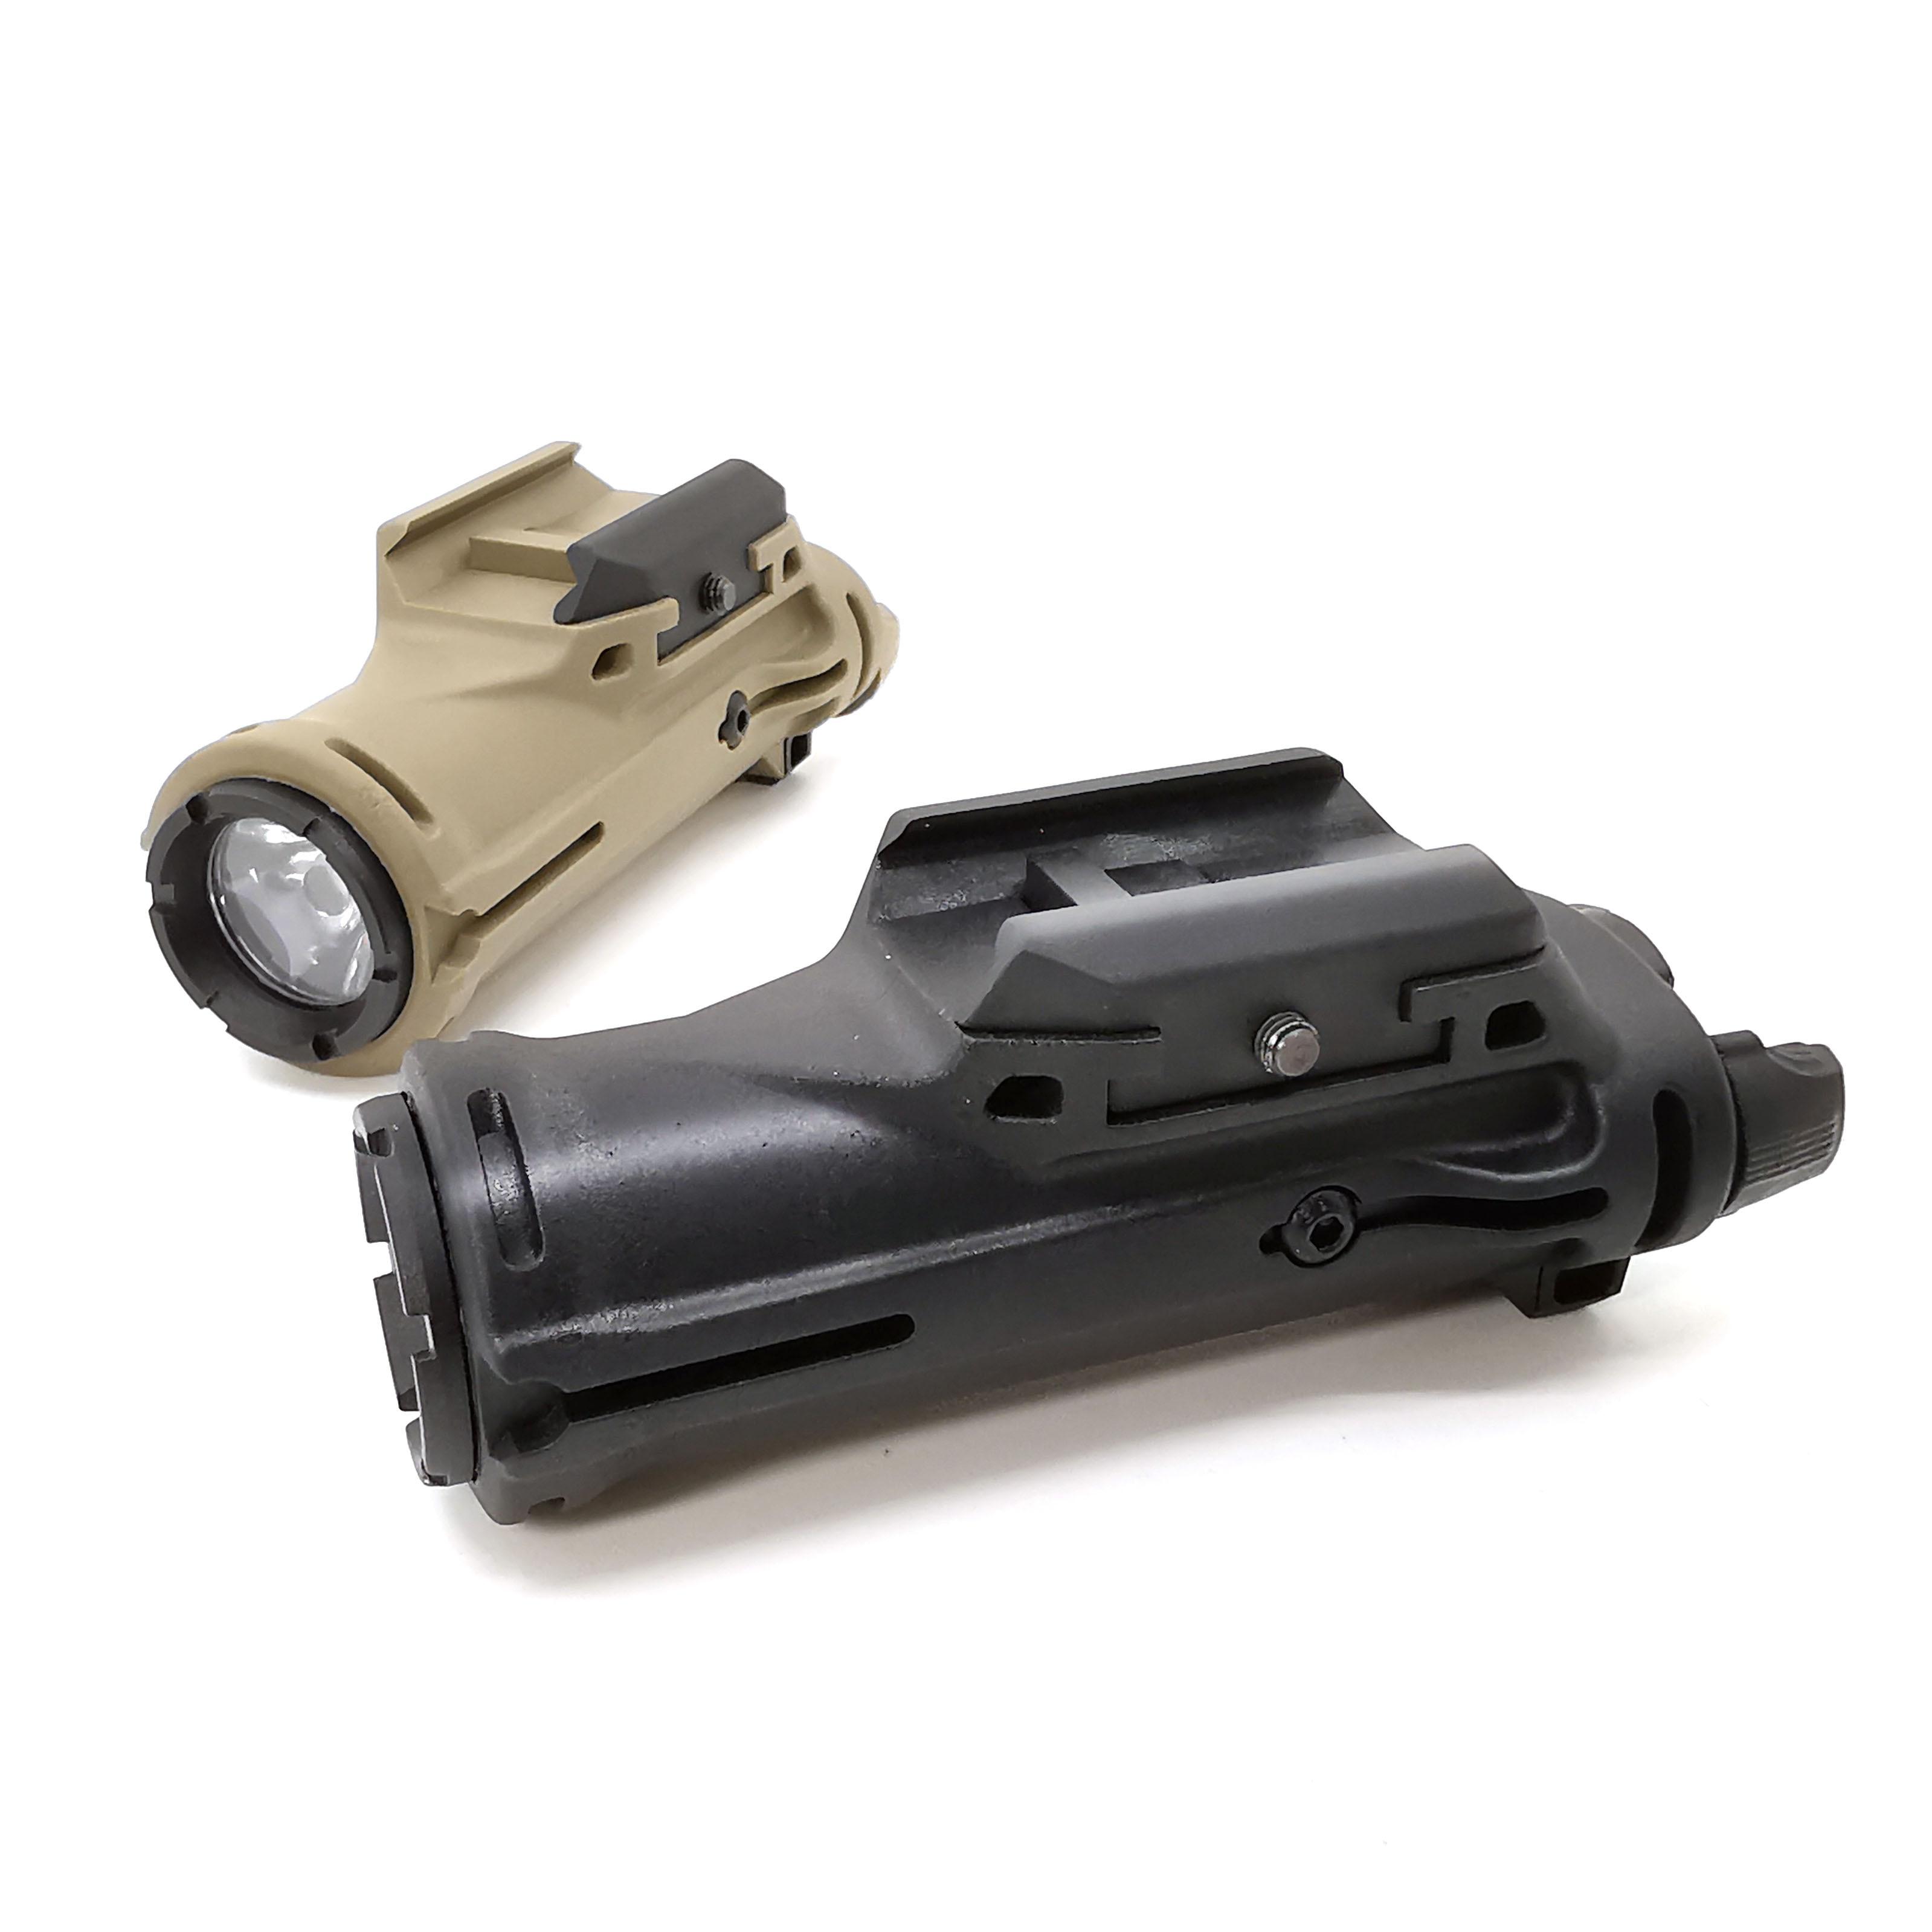 Tactical hunting scope Flashlight XH15 Light Airsoft White LED Brightness Weapon light For Pistol Rifle Picatinny Rail